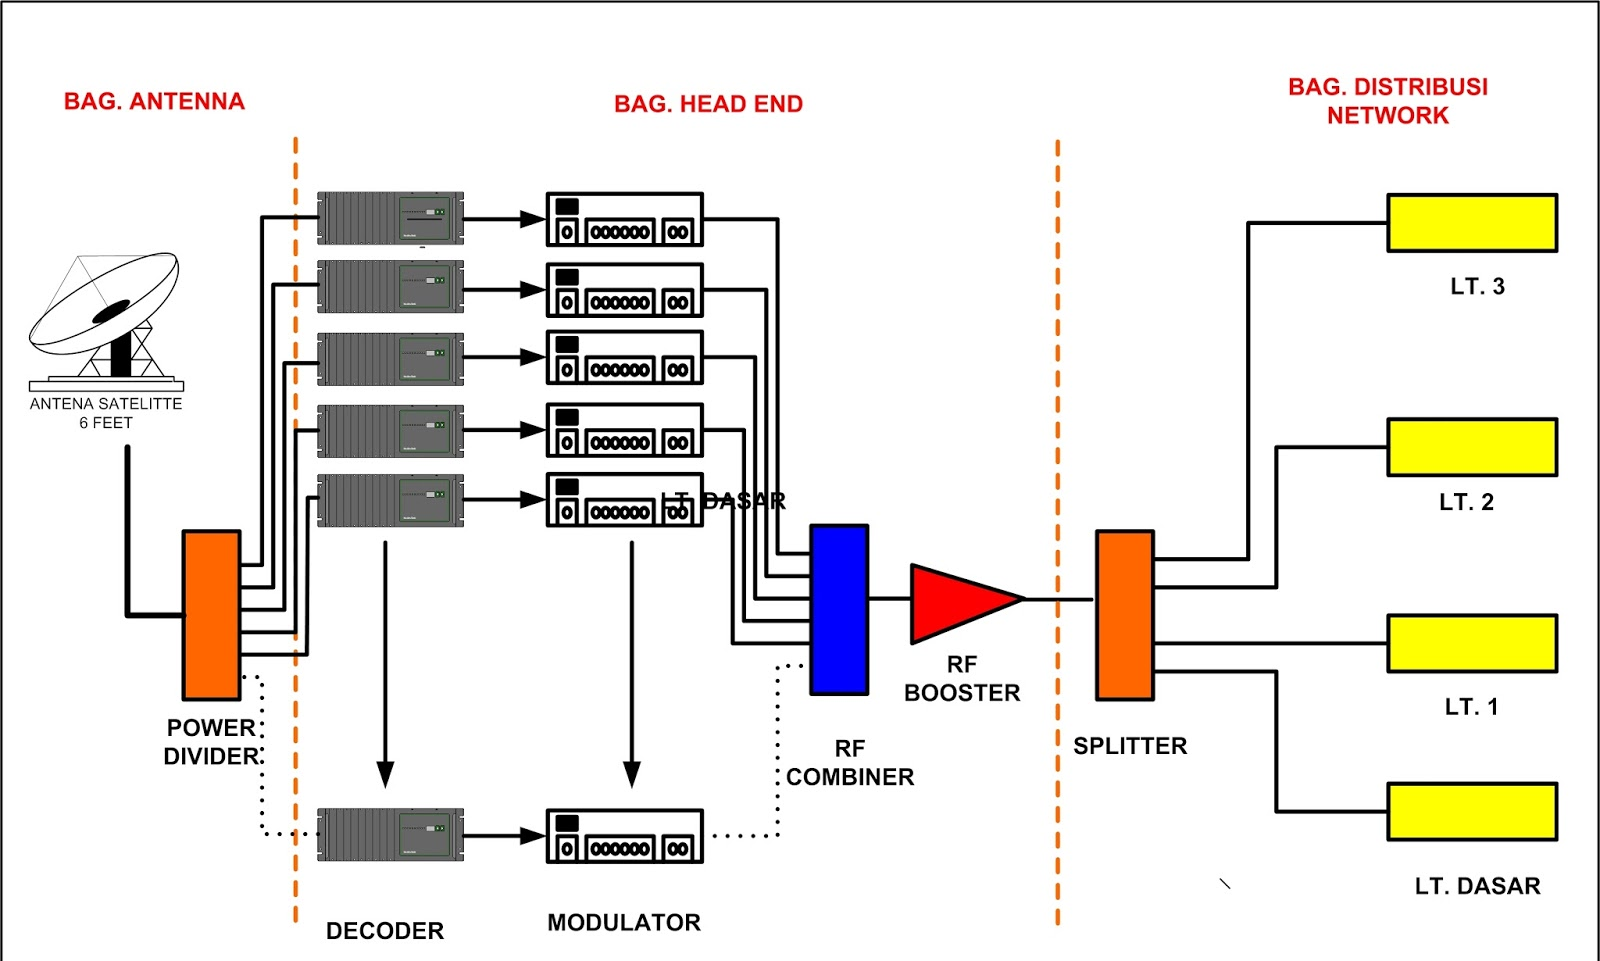 fiber optic matv diagram wiring diagram ebook fiber optic matv diagram [ 1600 x 961 Pixel ]